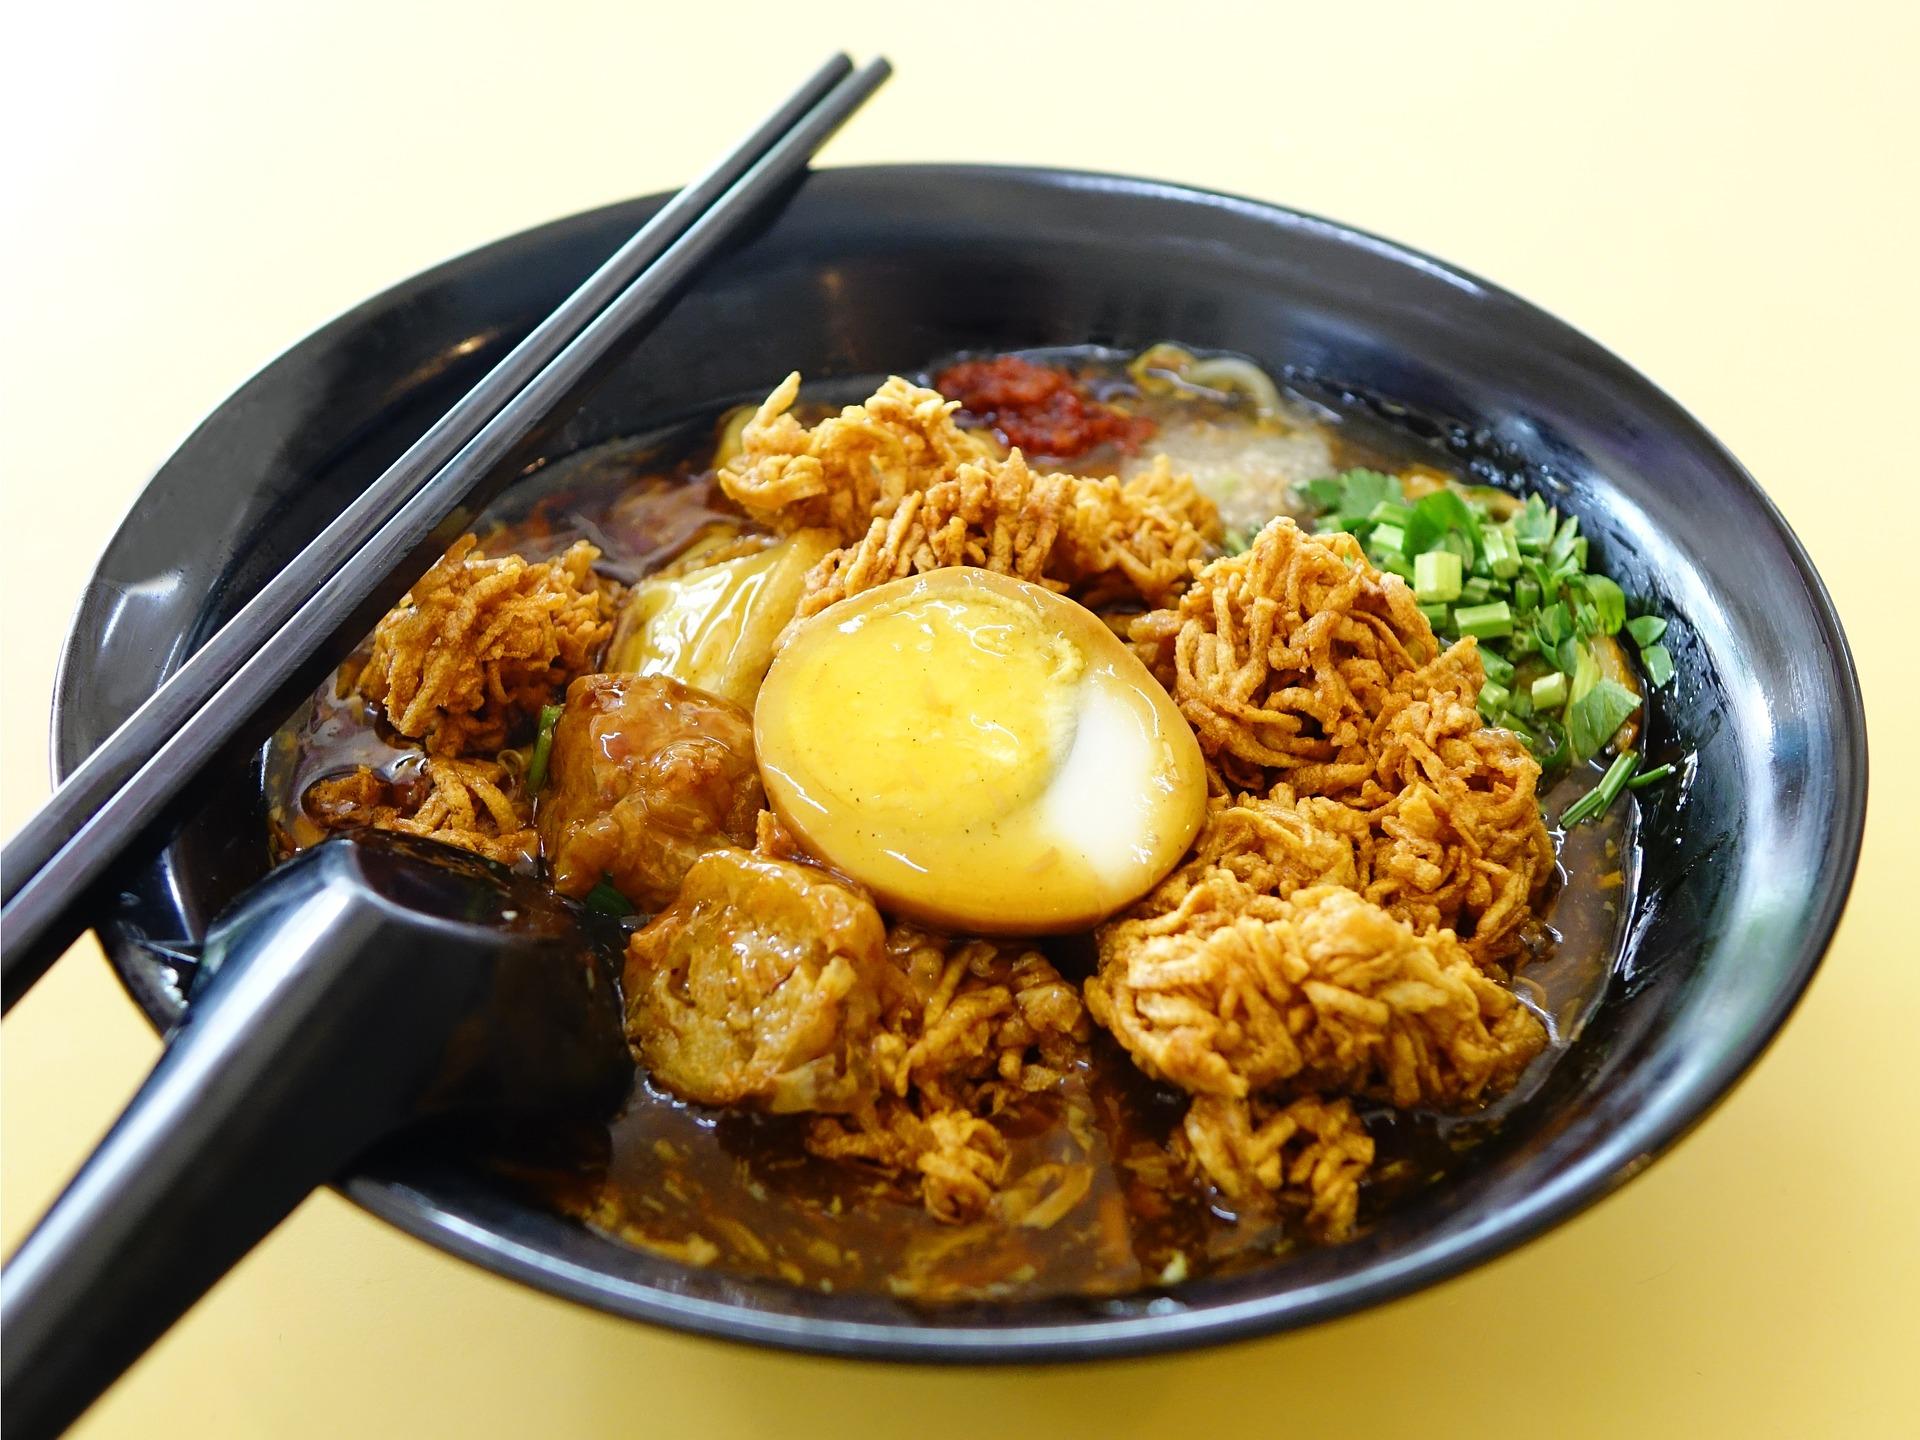 Lor Mee, Chinese, Dish, Food, Fresh, HQ Photo